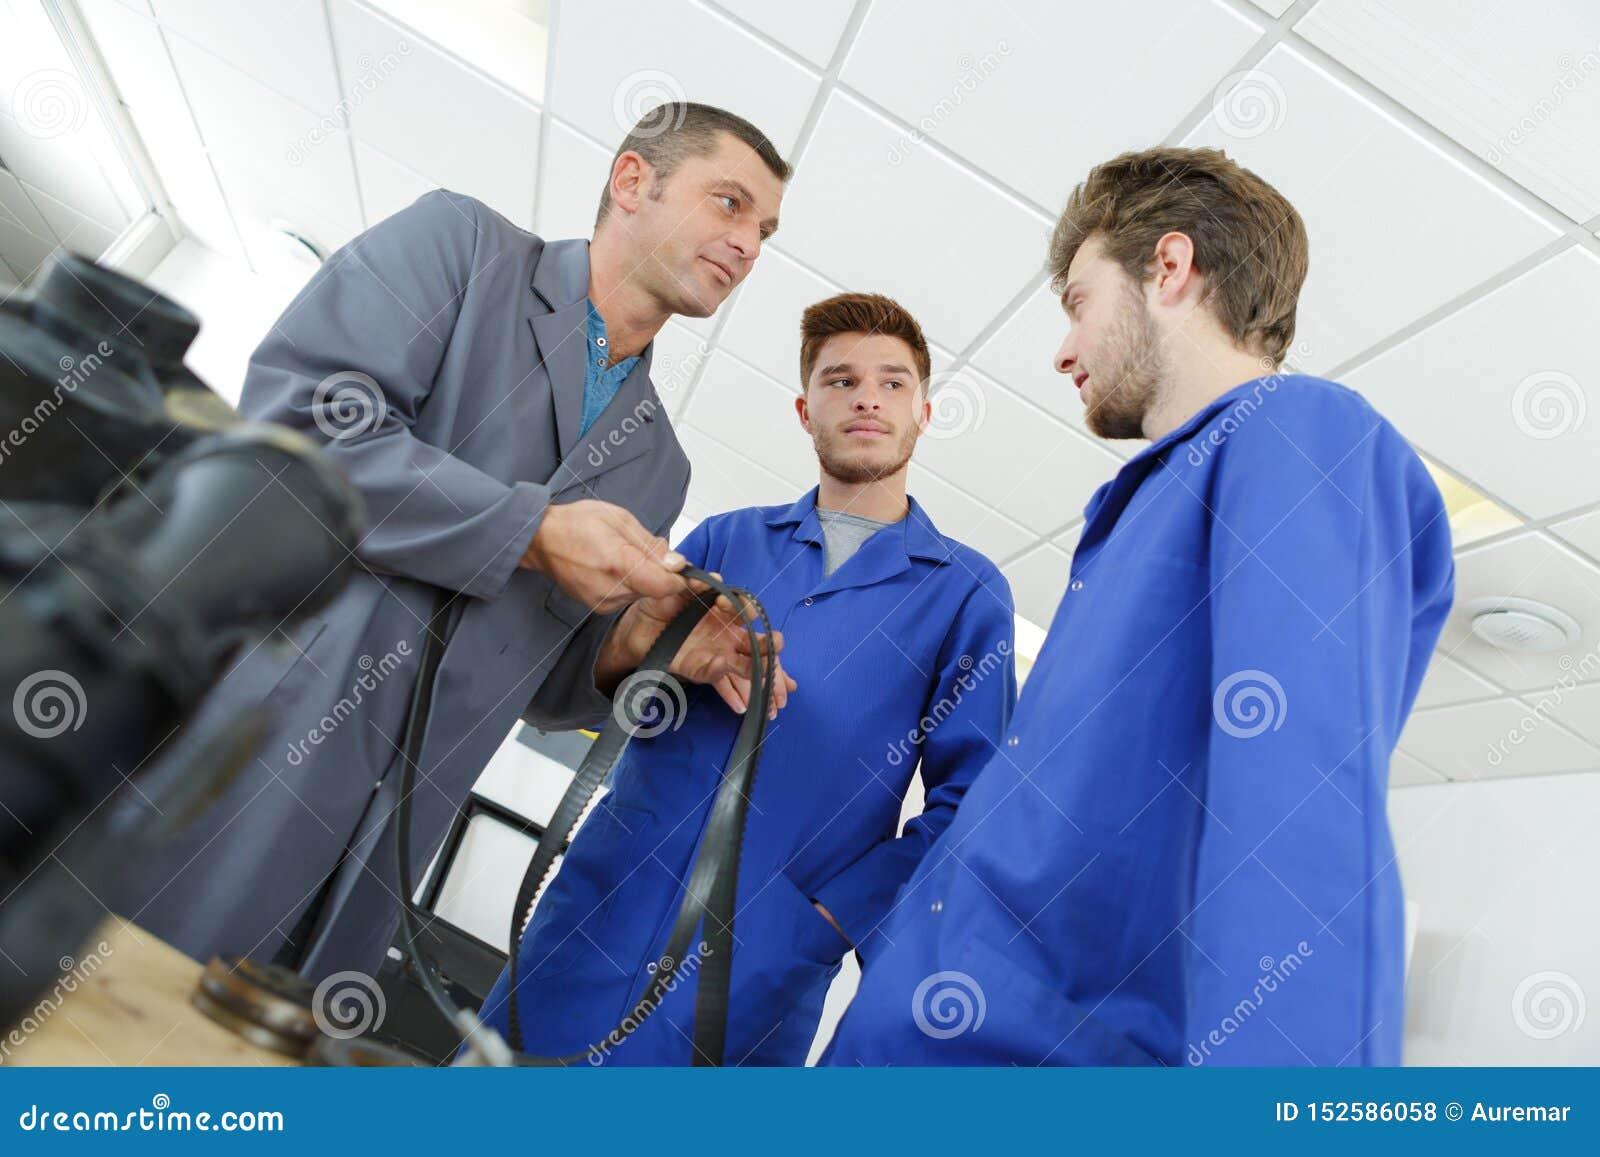 Apprentice mechanics in auto shop working on car engine